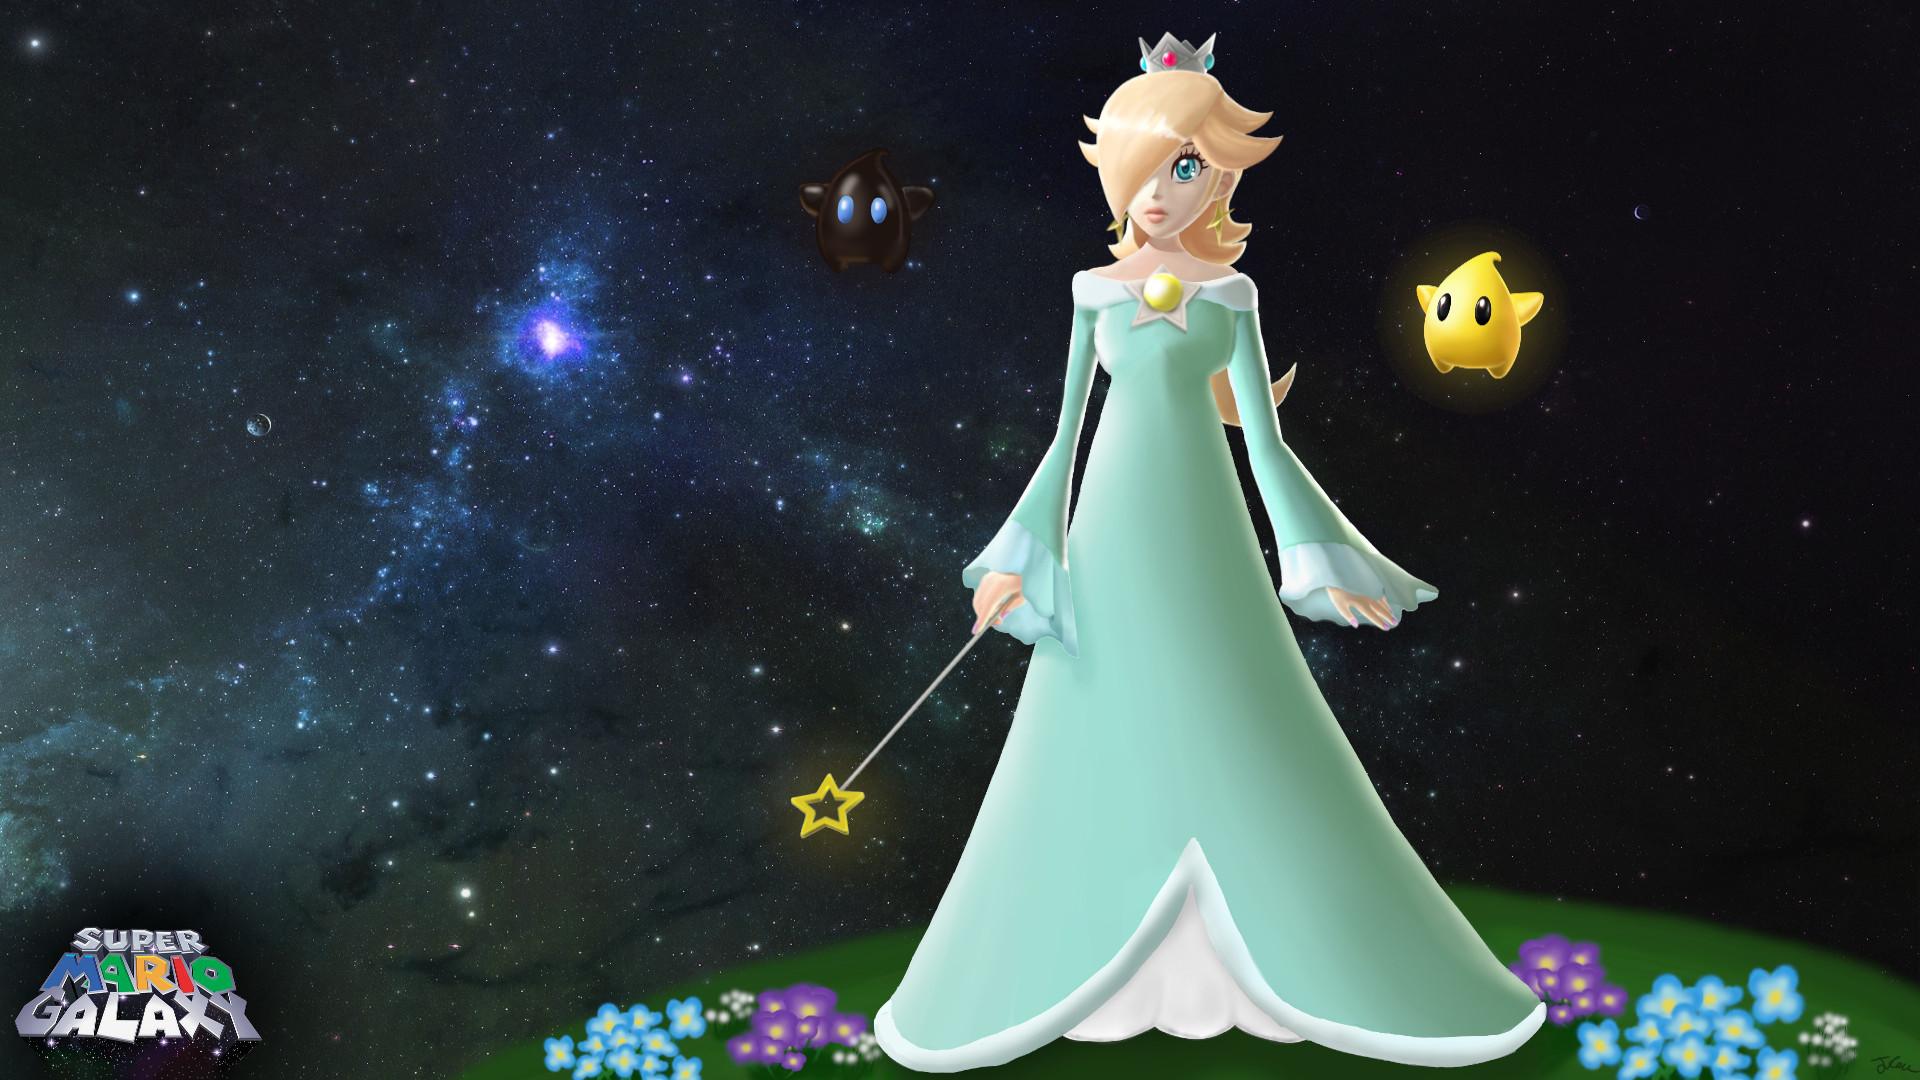 Rosalina – Super Mario Galaxy by KevinGhost on deviantART